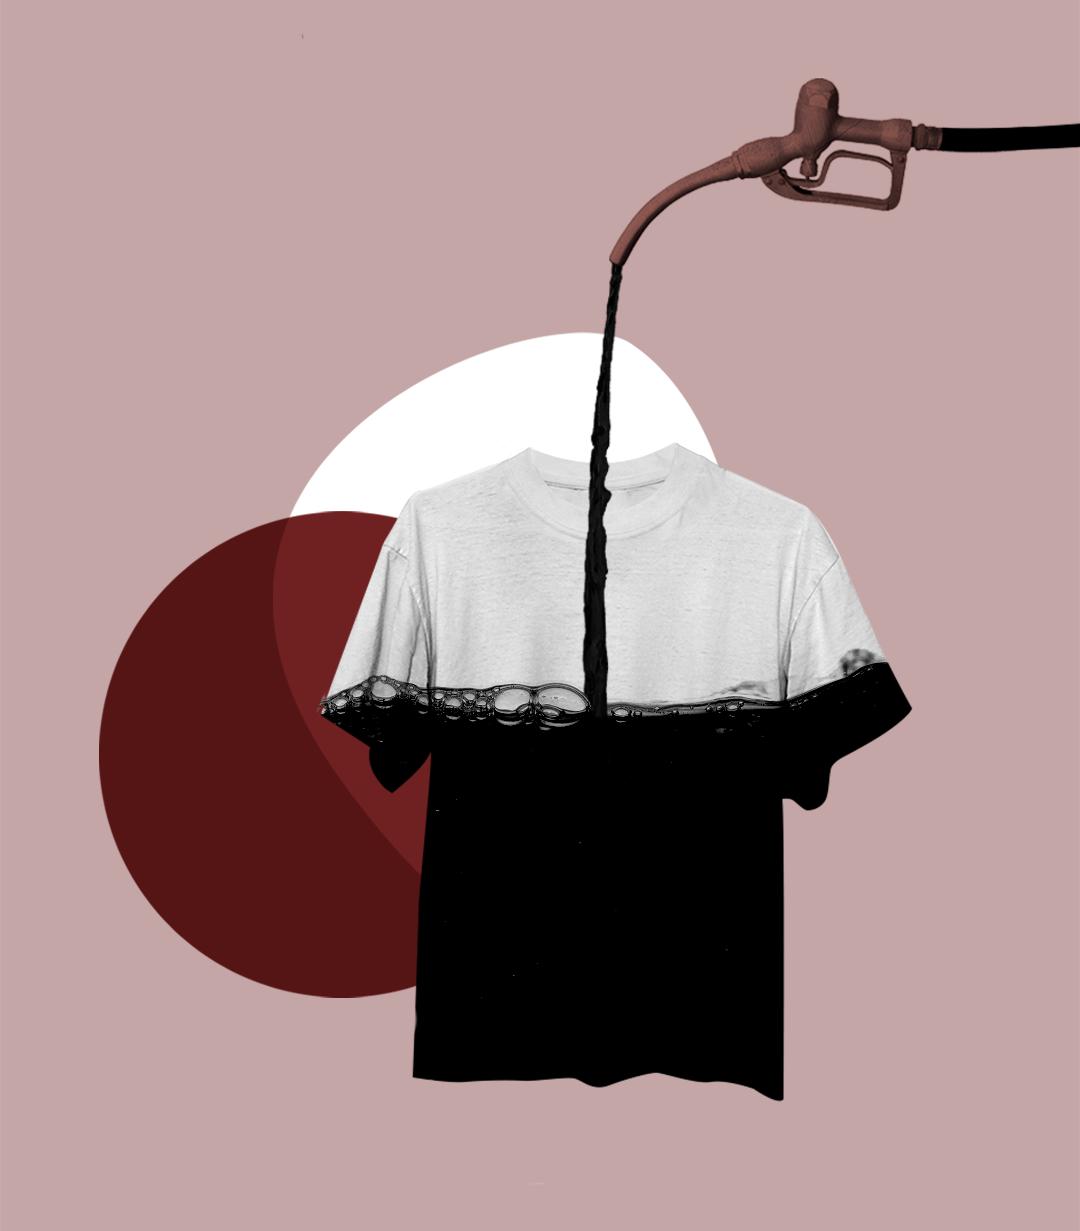 Toxic Fashion - Protect from Toxic Fashion